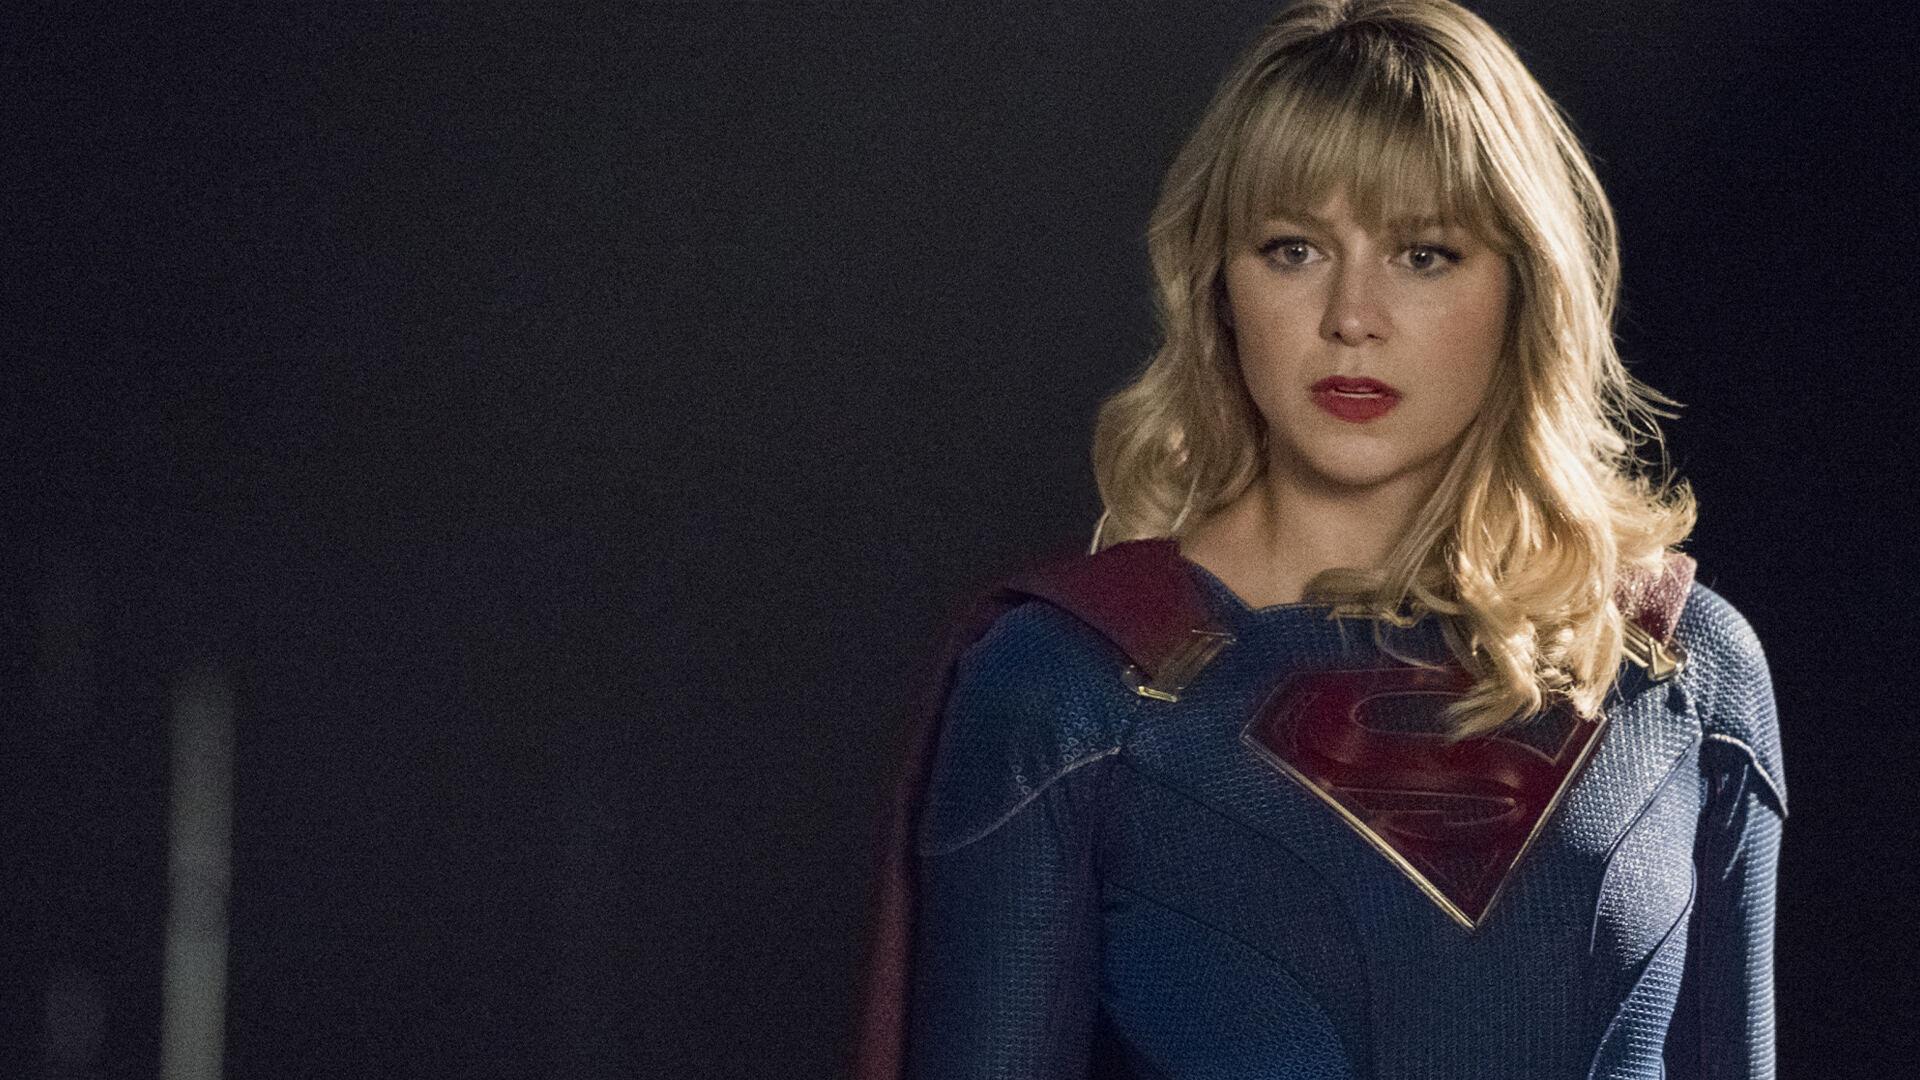 Premium Action Supergirl V (V.O.)